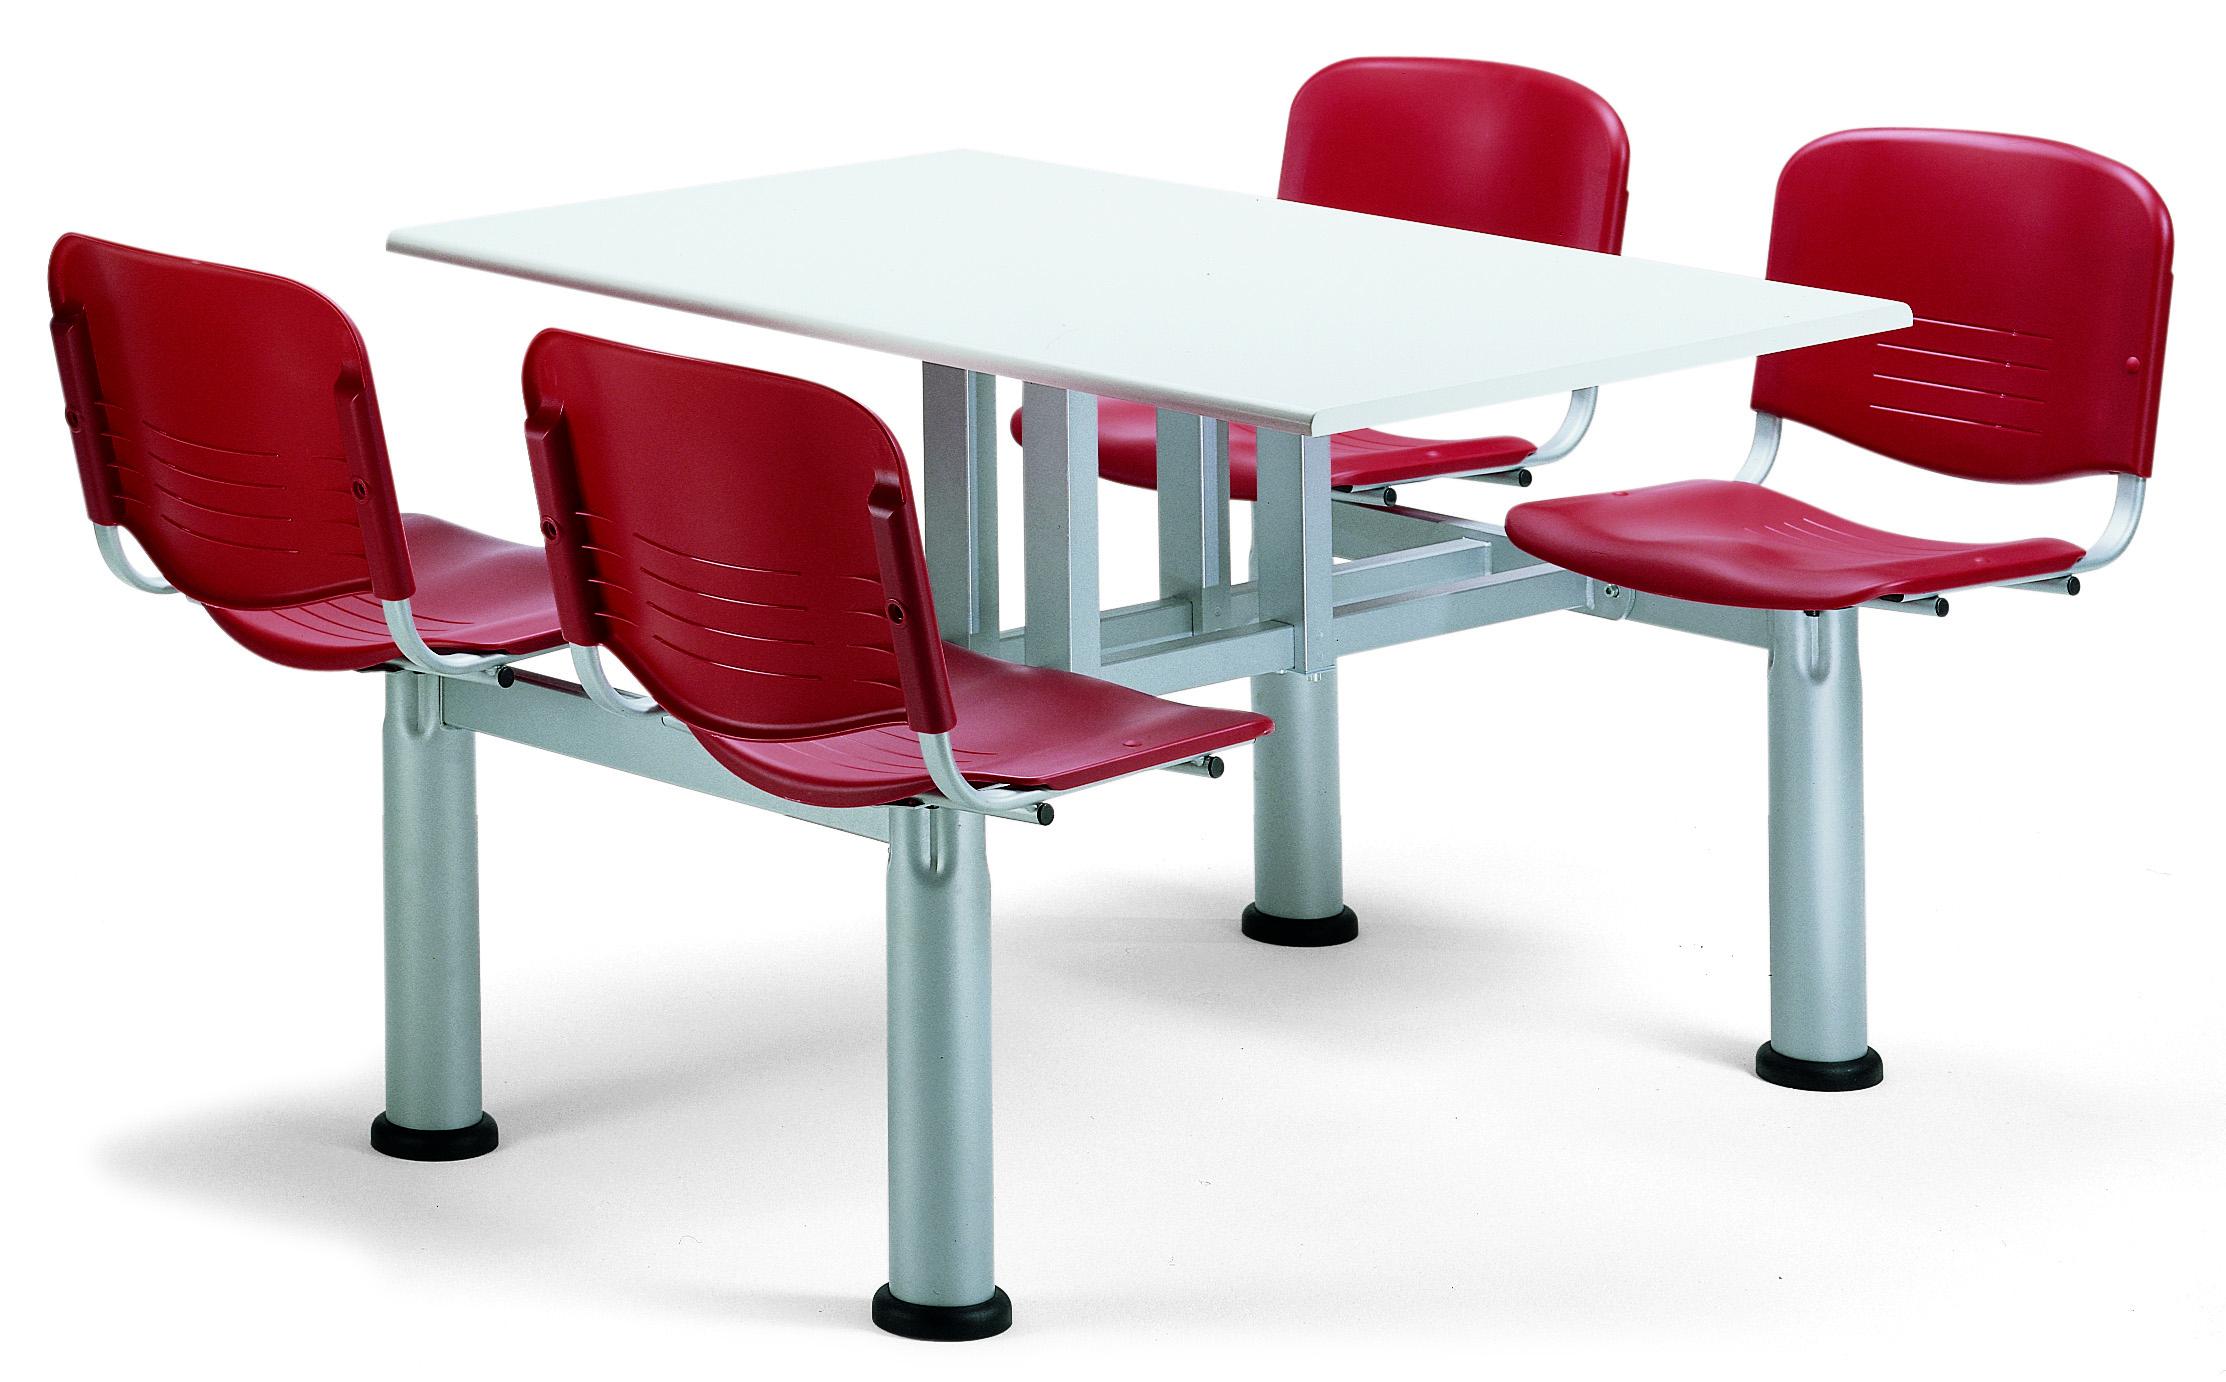 Mesas para comedores de empresas escuelas cafeterias - Mesas de comedores ...